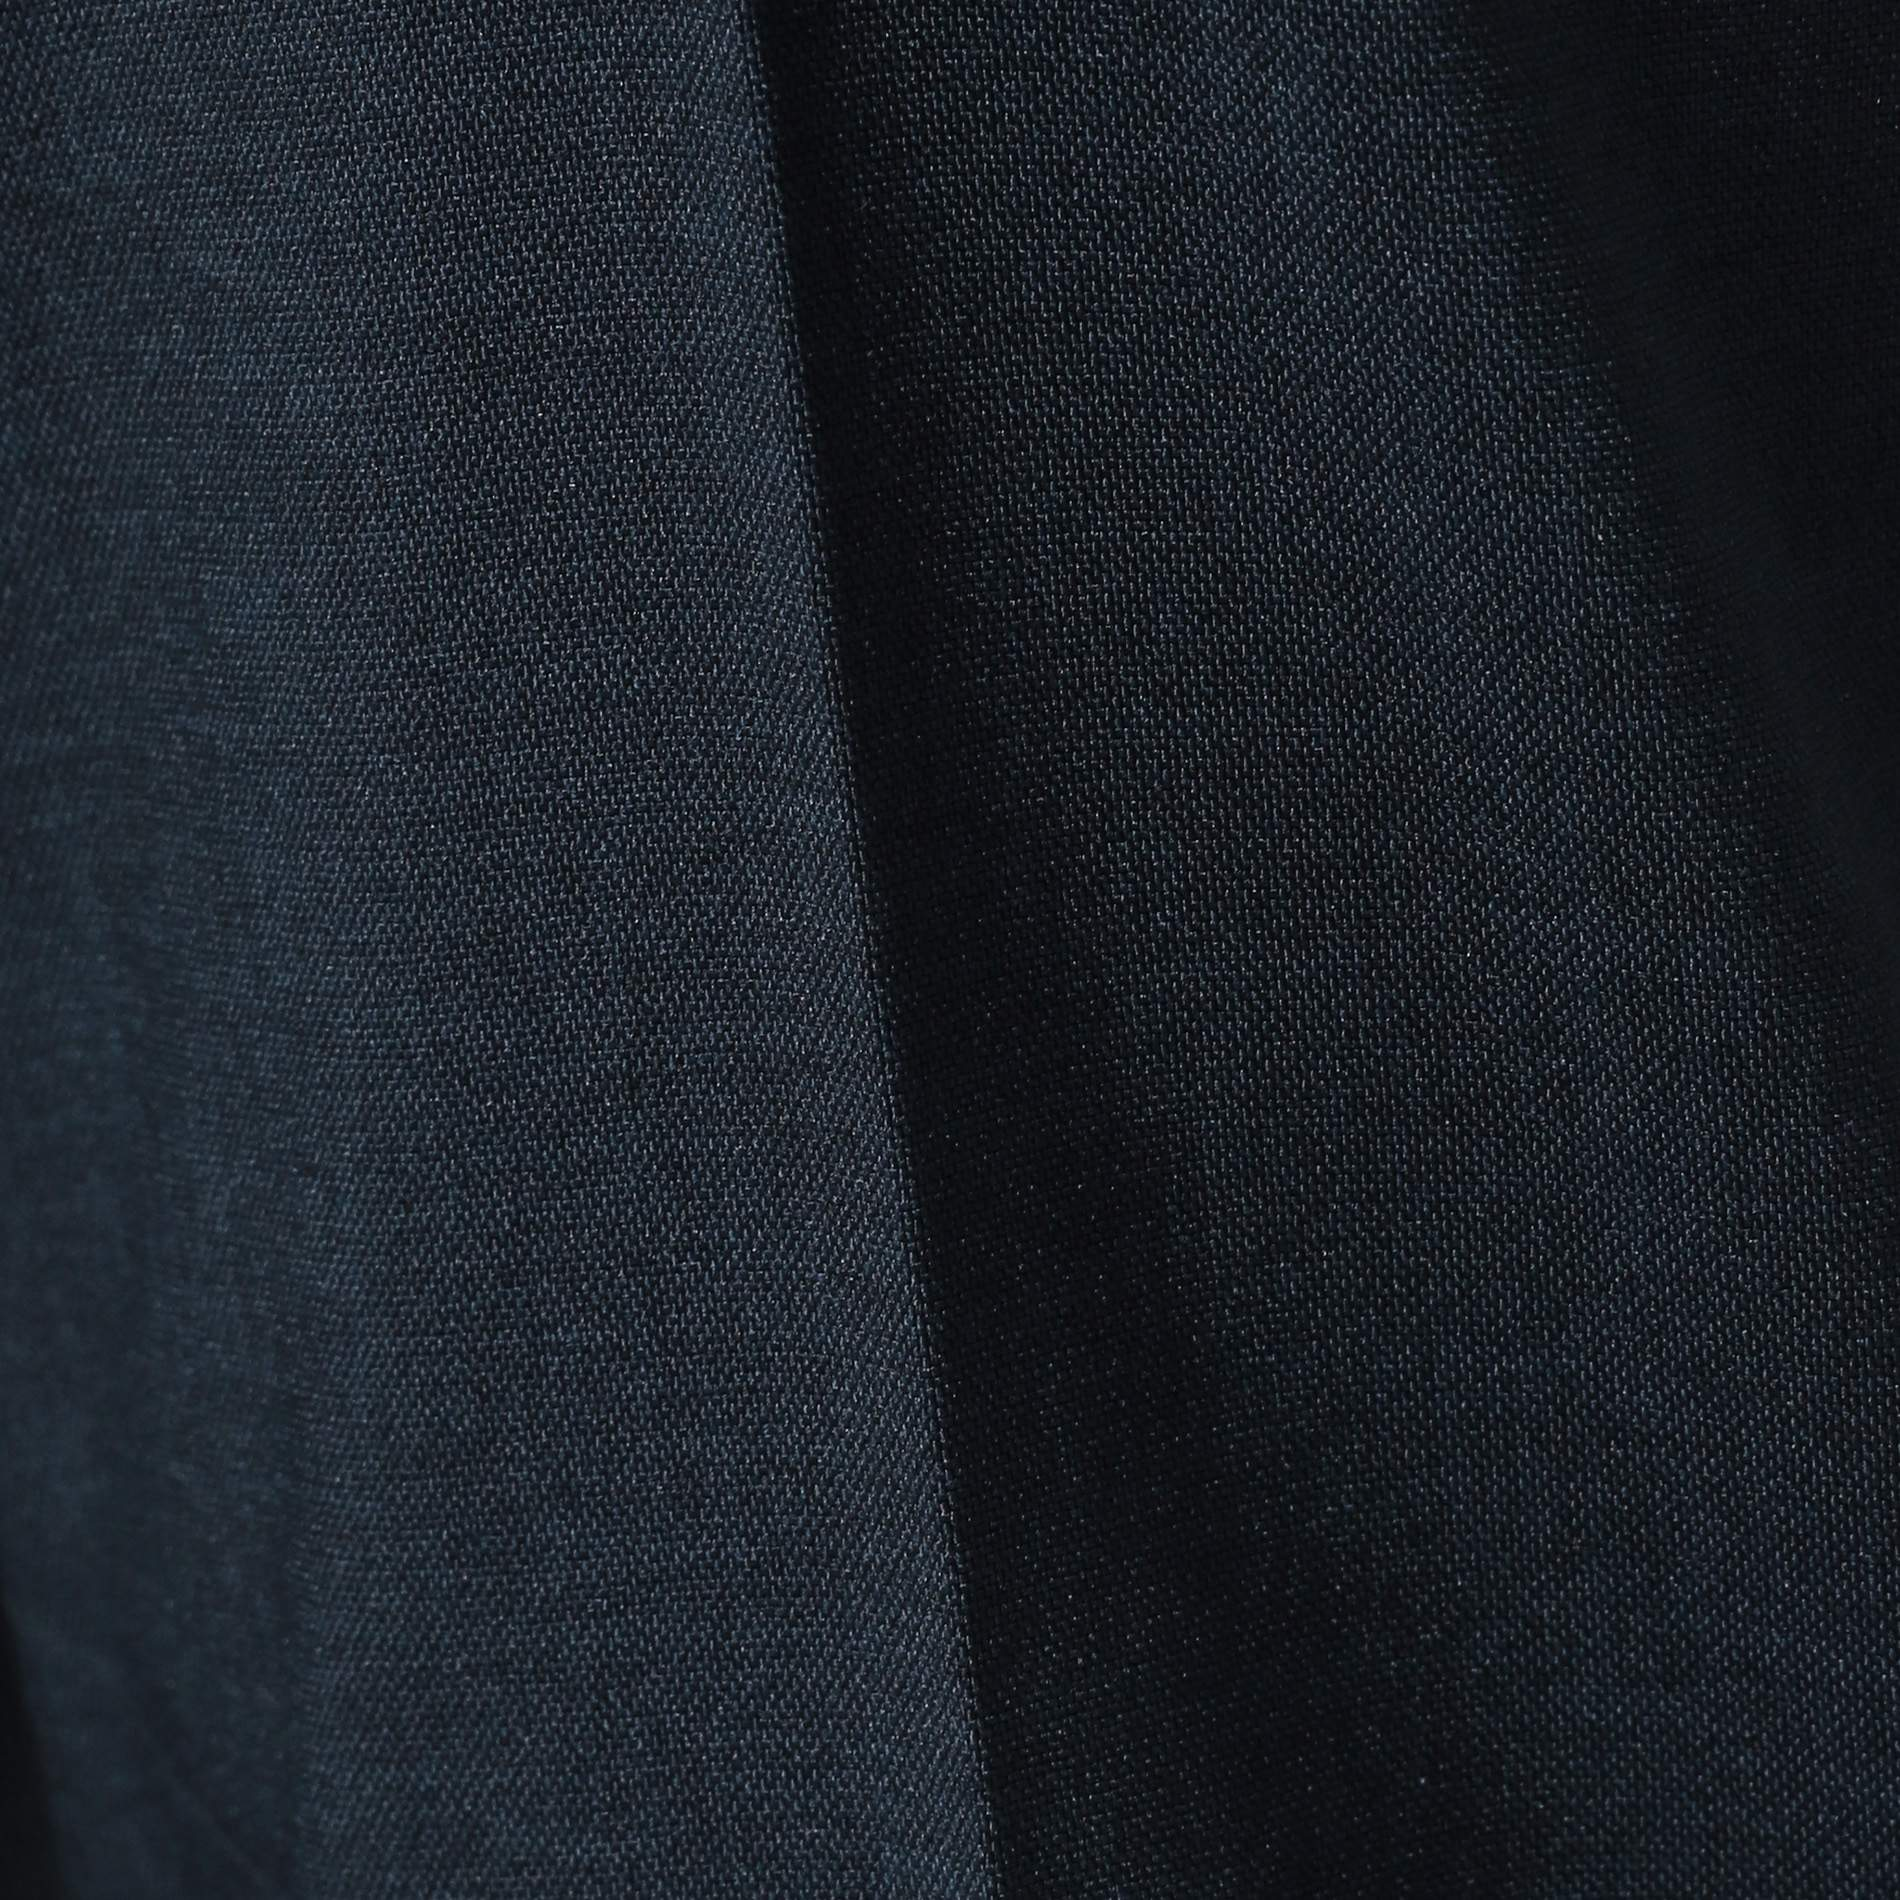 【WEB限定】クールドッツパンツ